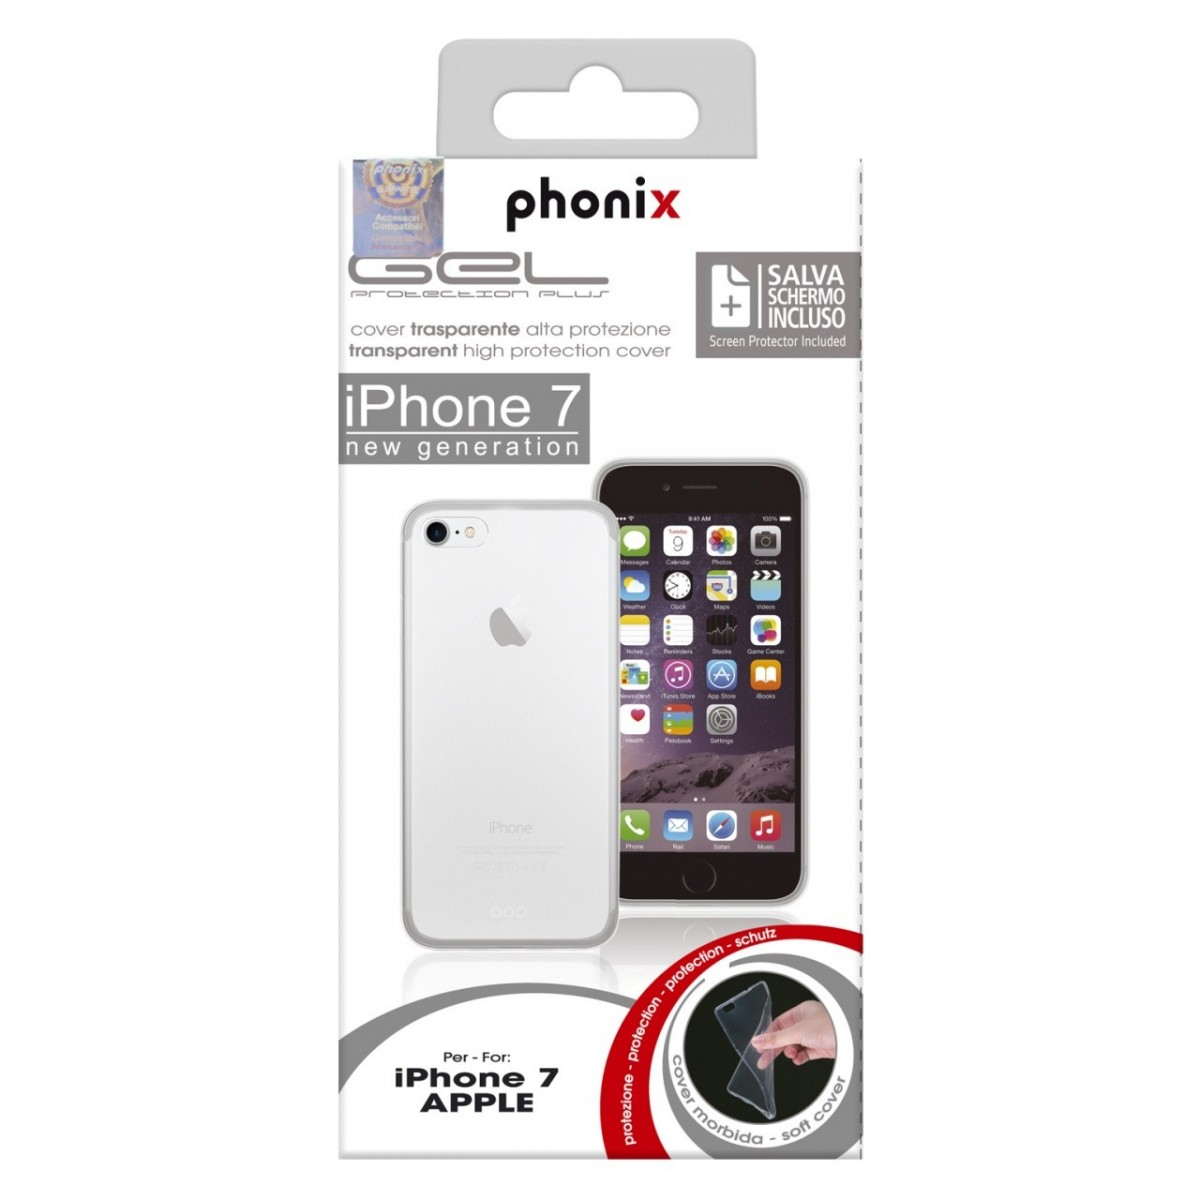 apple cover iphone 7 trasparente